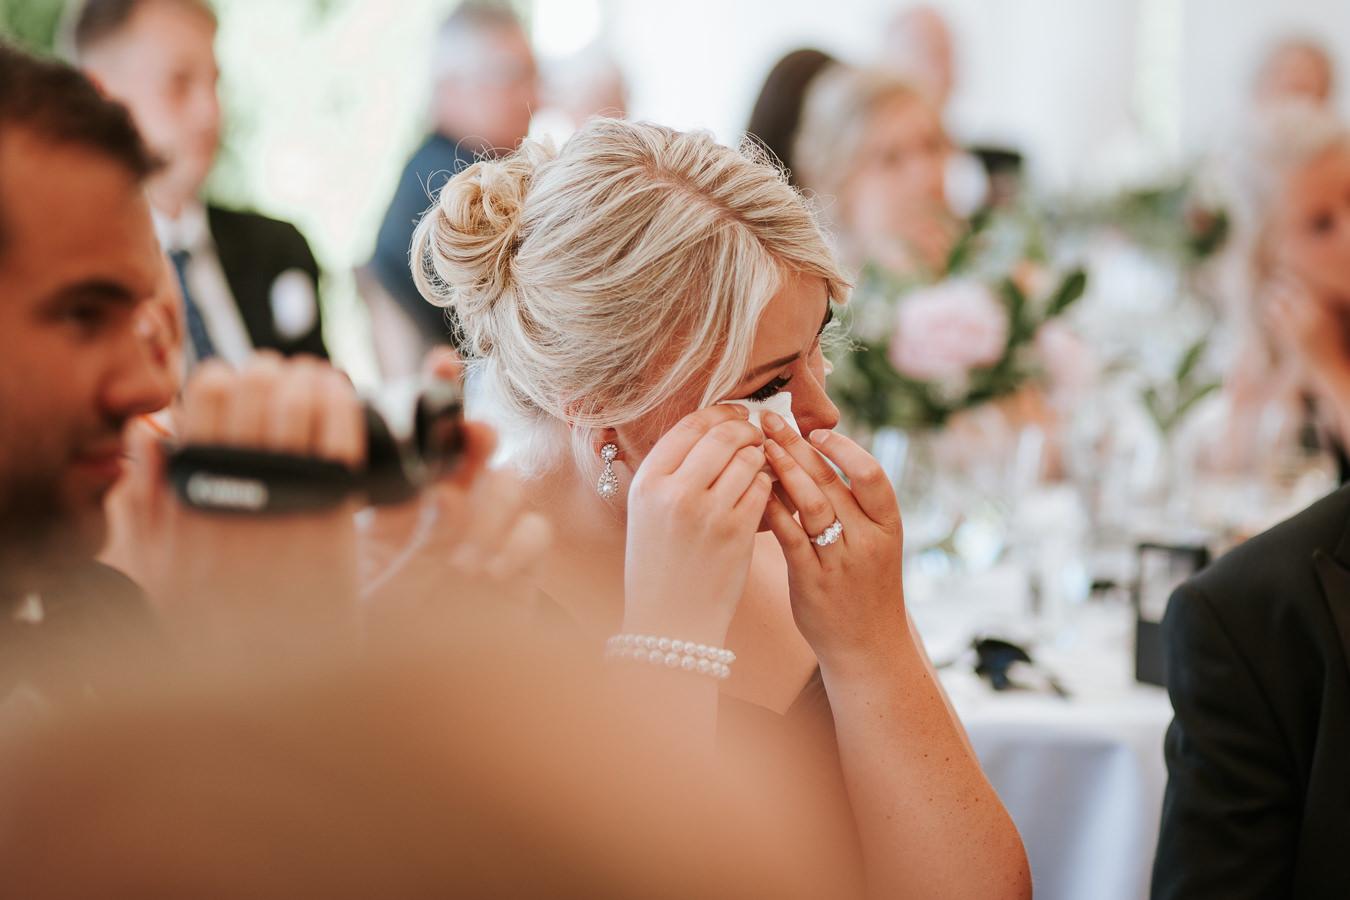 Bryllup-Hellviktangen-fotograf-tvedt-151.jpg